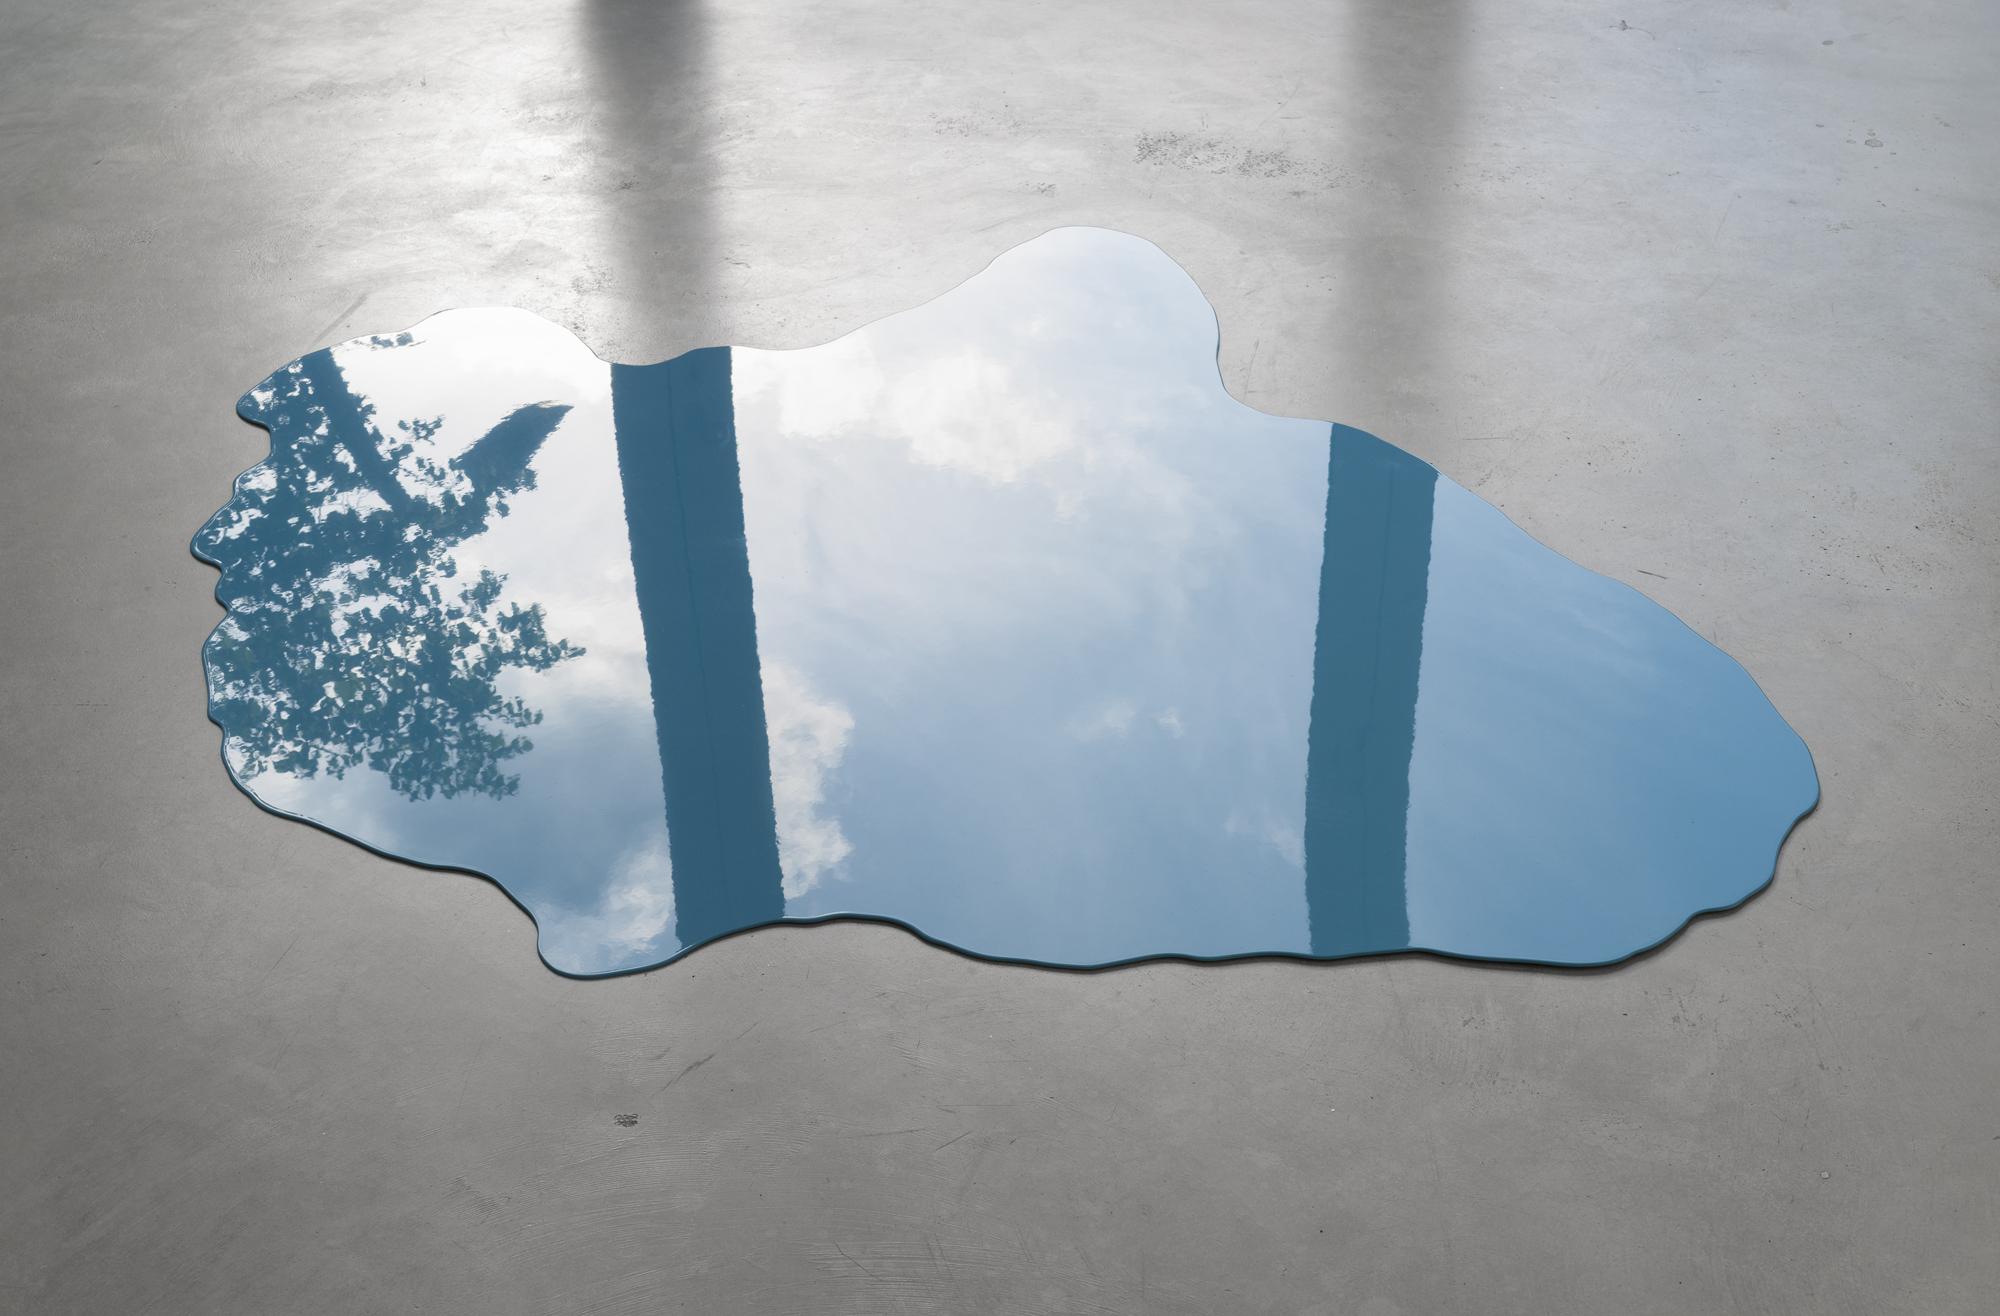 Alexander Gutke, Big Sky Blue, floor sculpture, metal, paint, variable dimensions, 2016